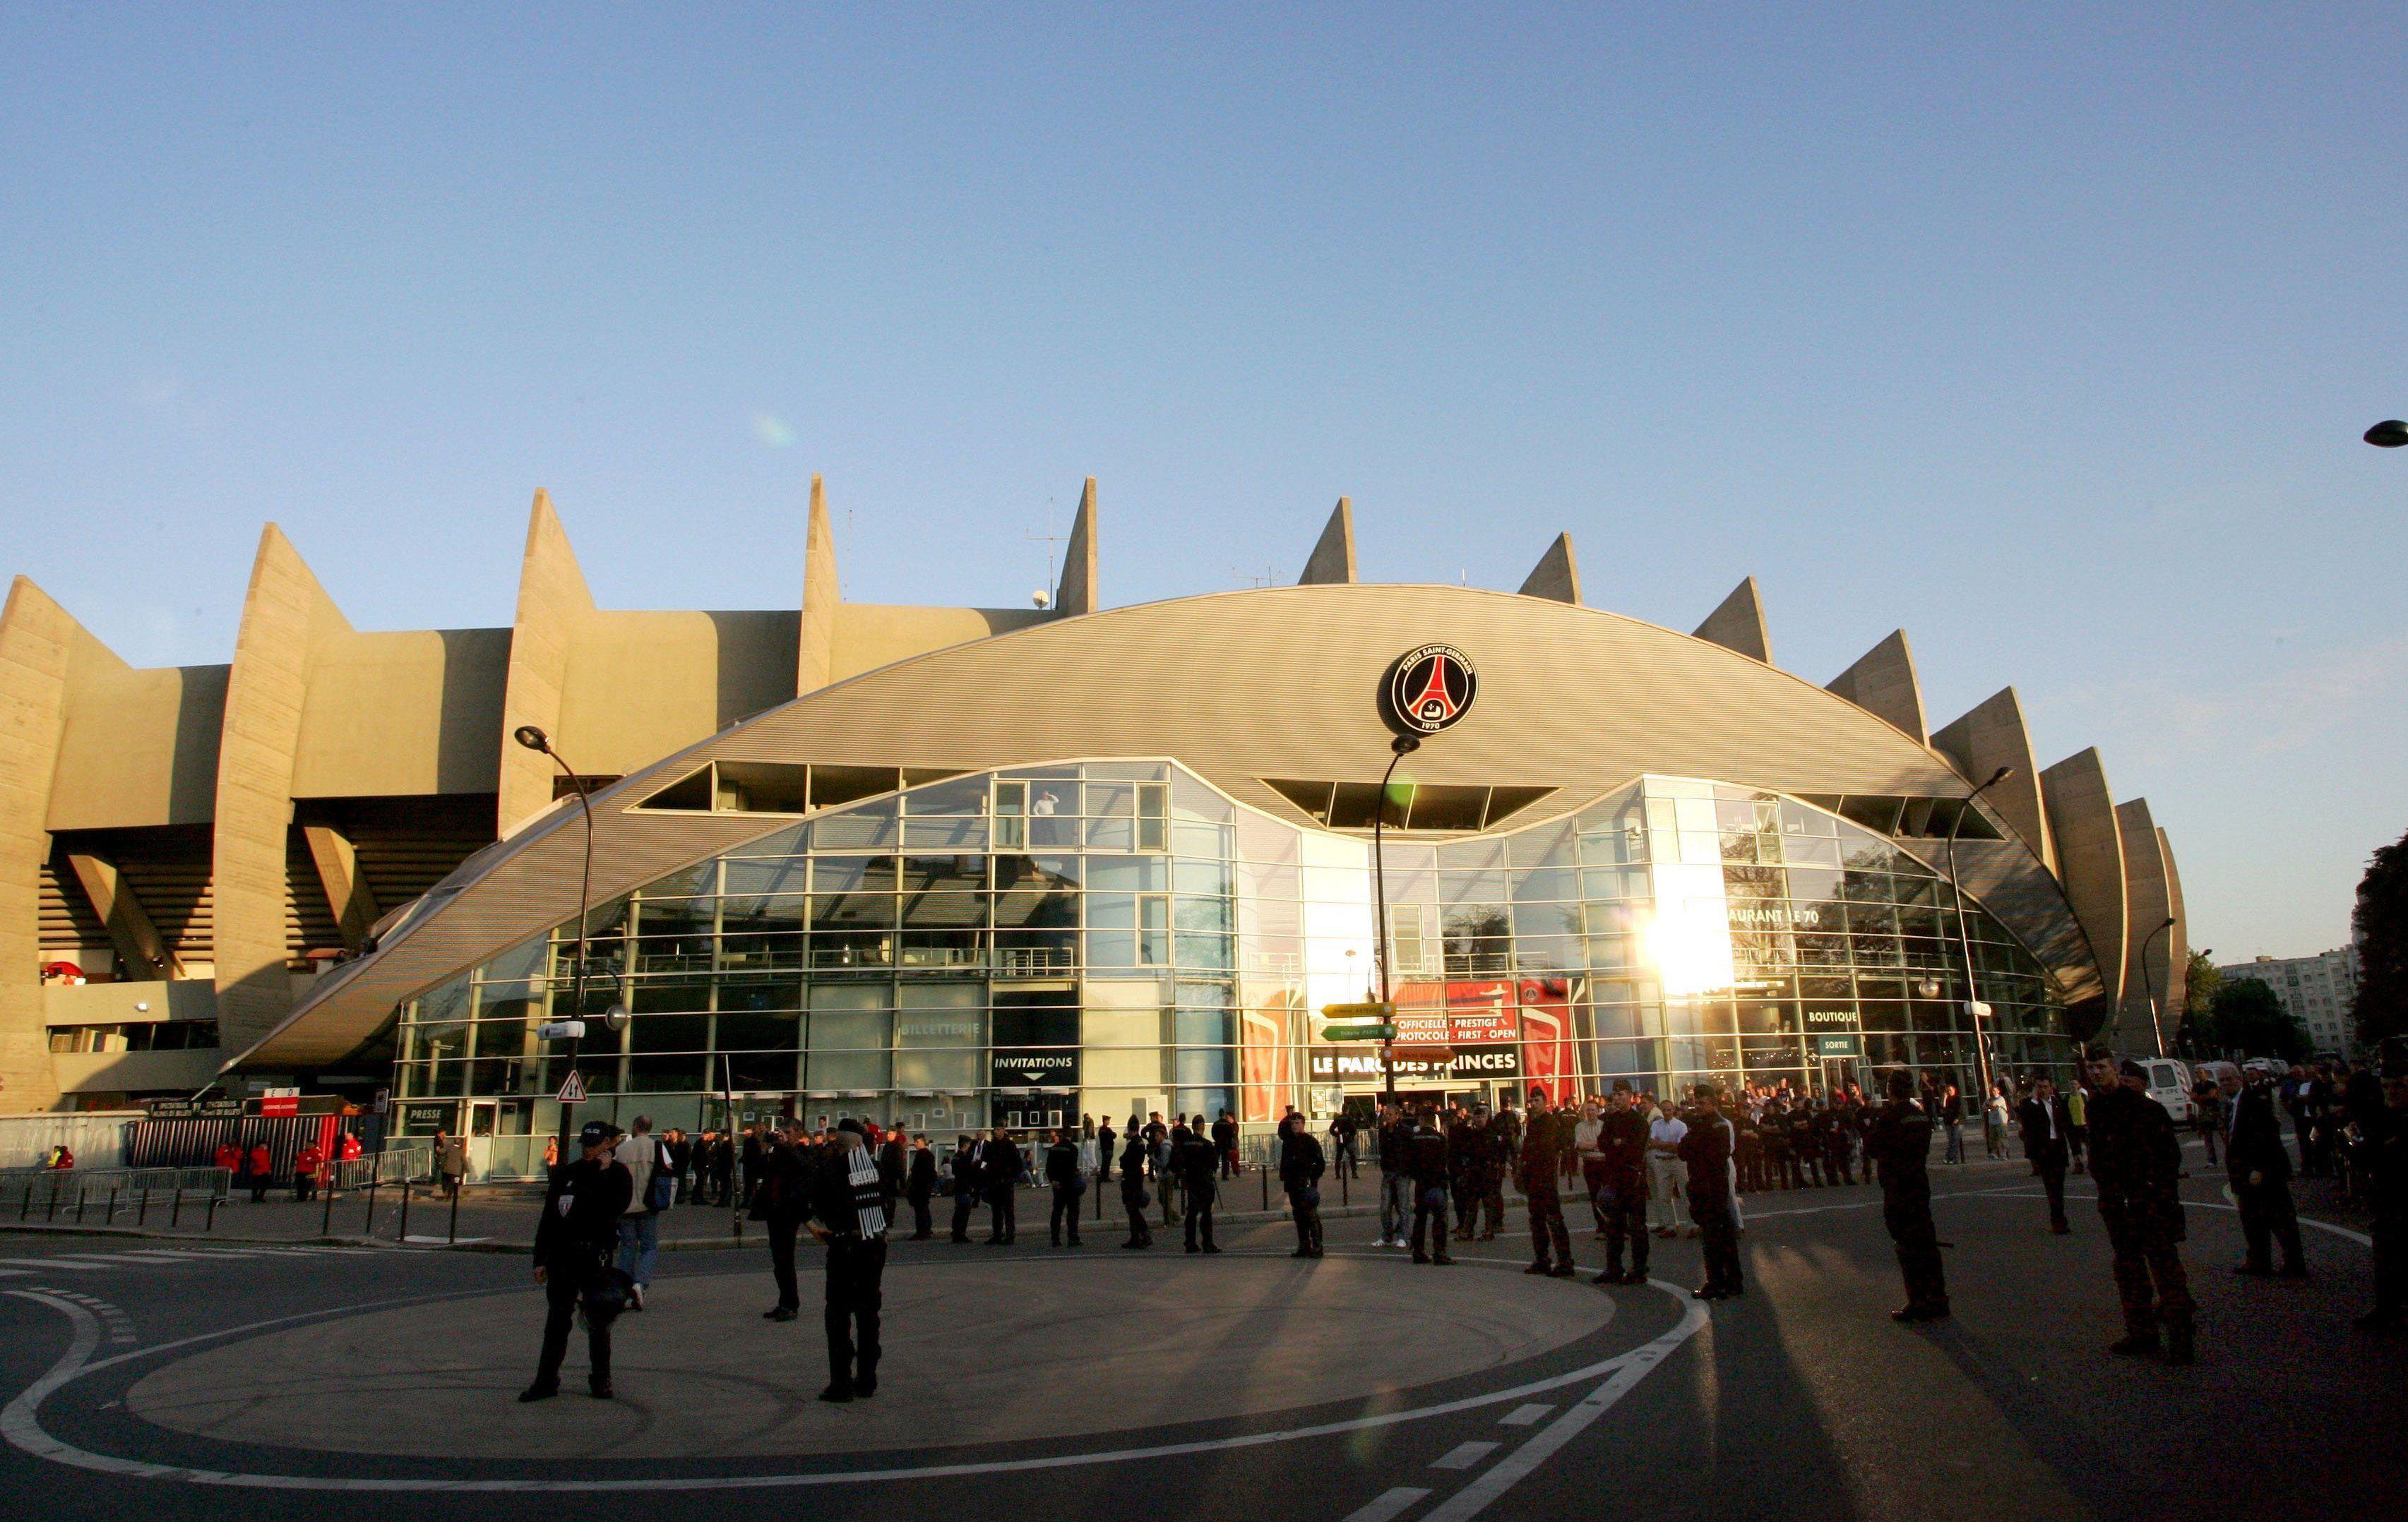 Siège du PSG | Prince, Parc, Stade